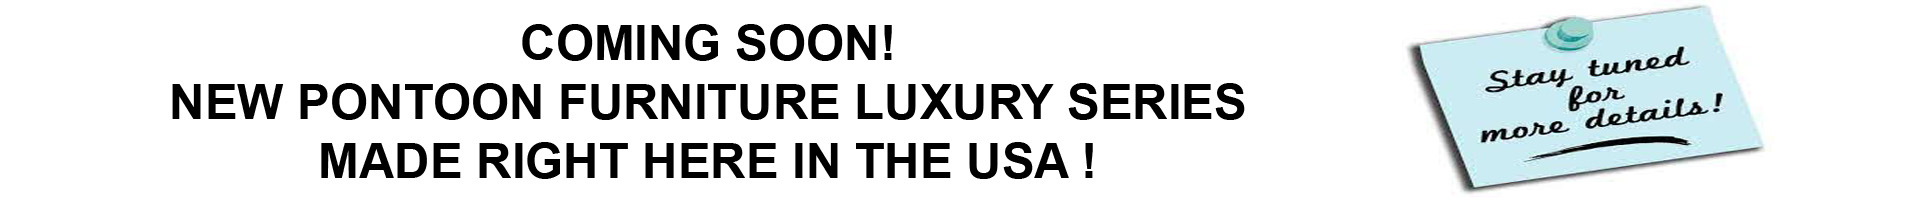 USA Pontoon furniture